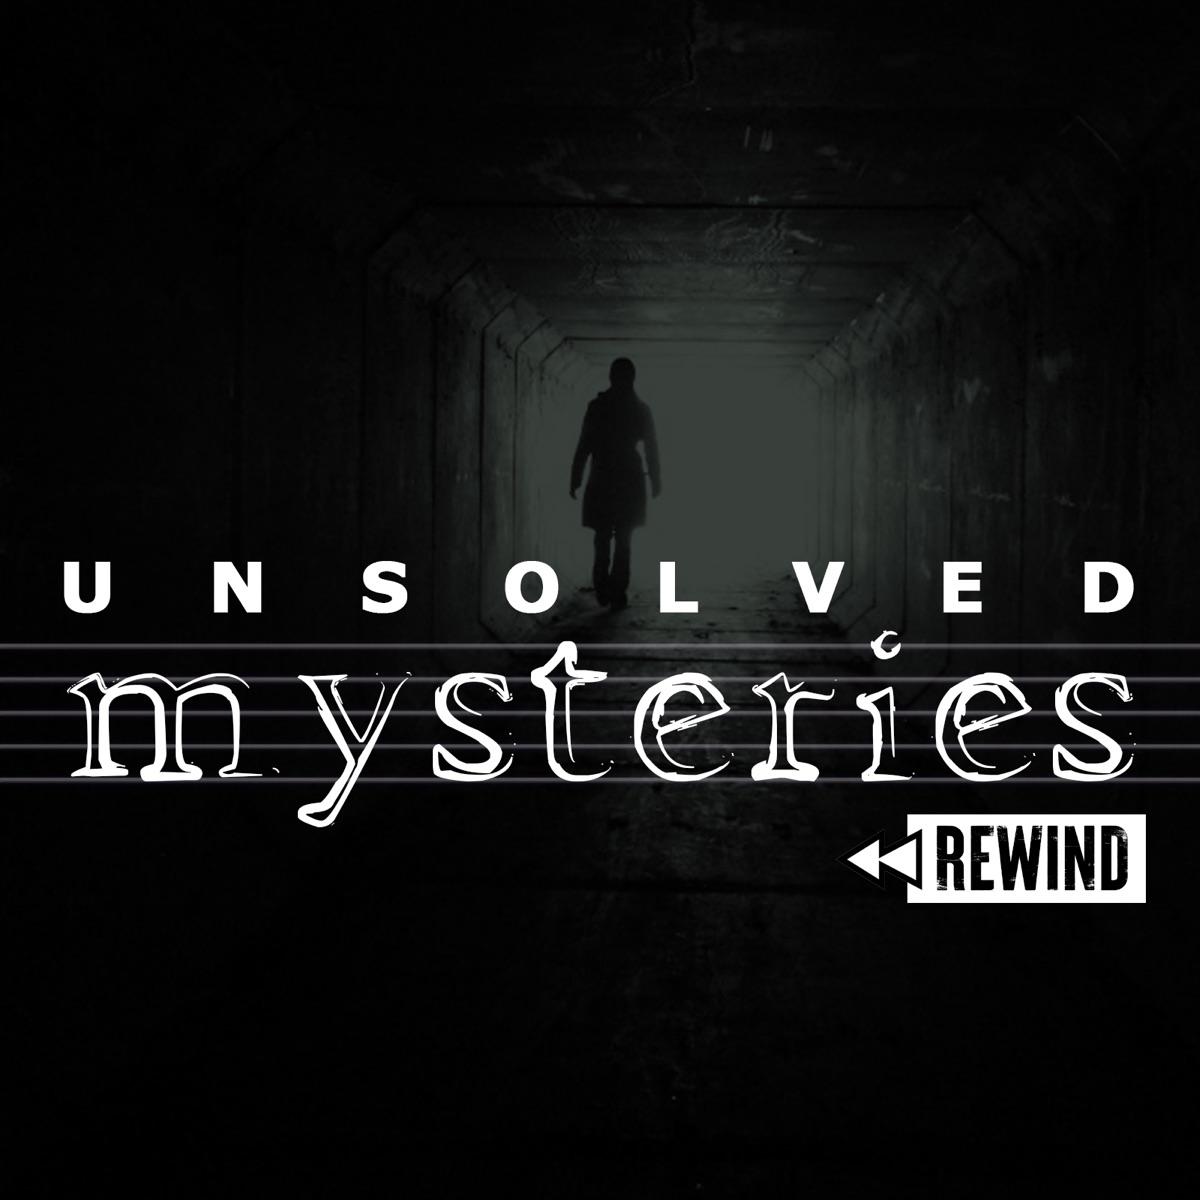 Unsolved Mysteries Rewind